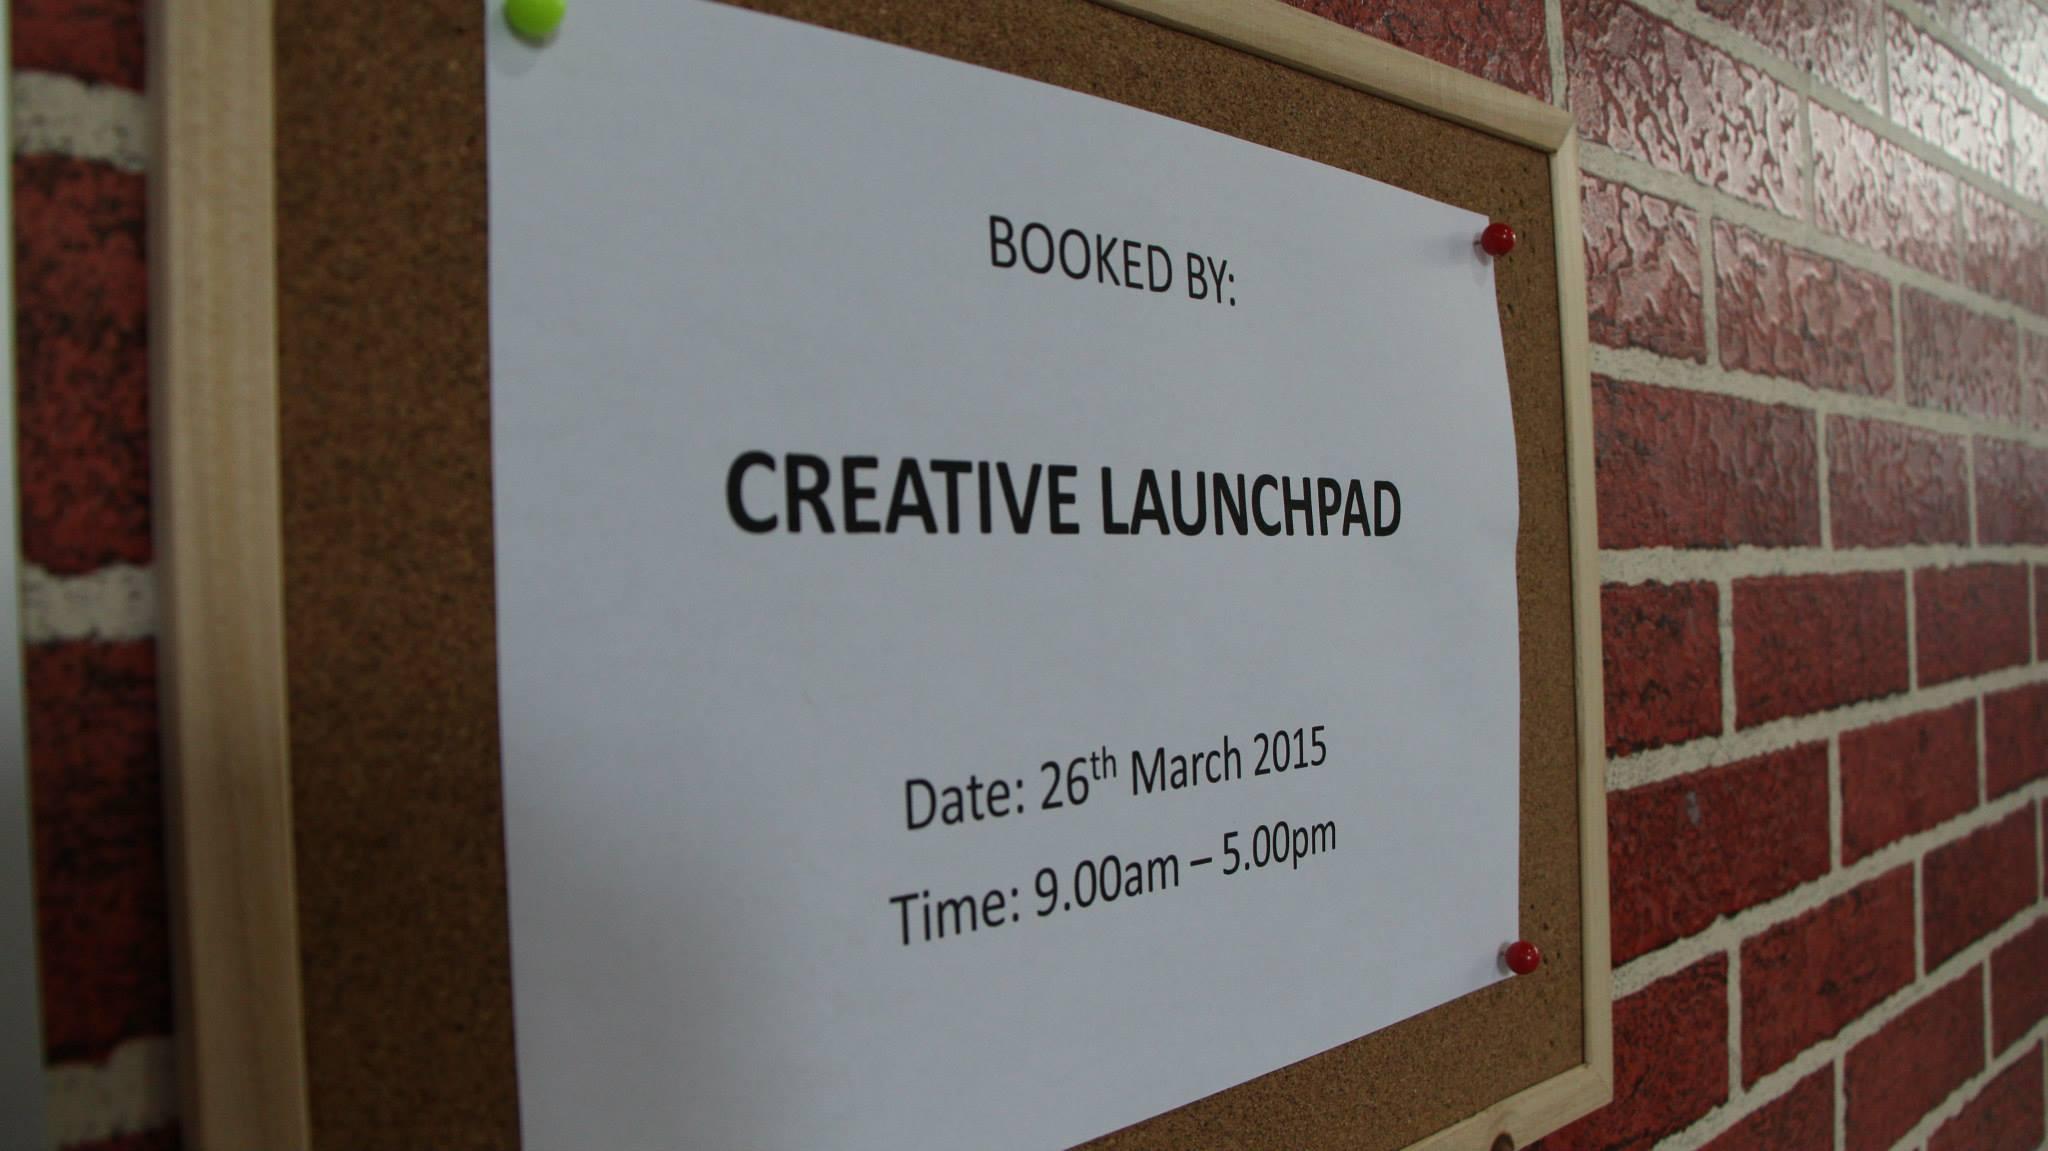 Creative Launchpad